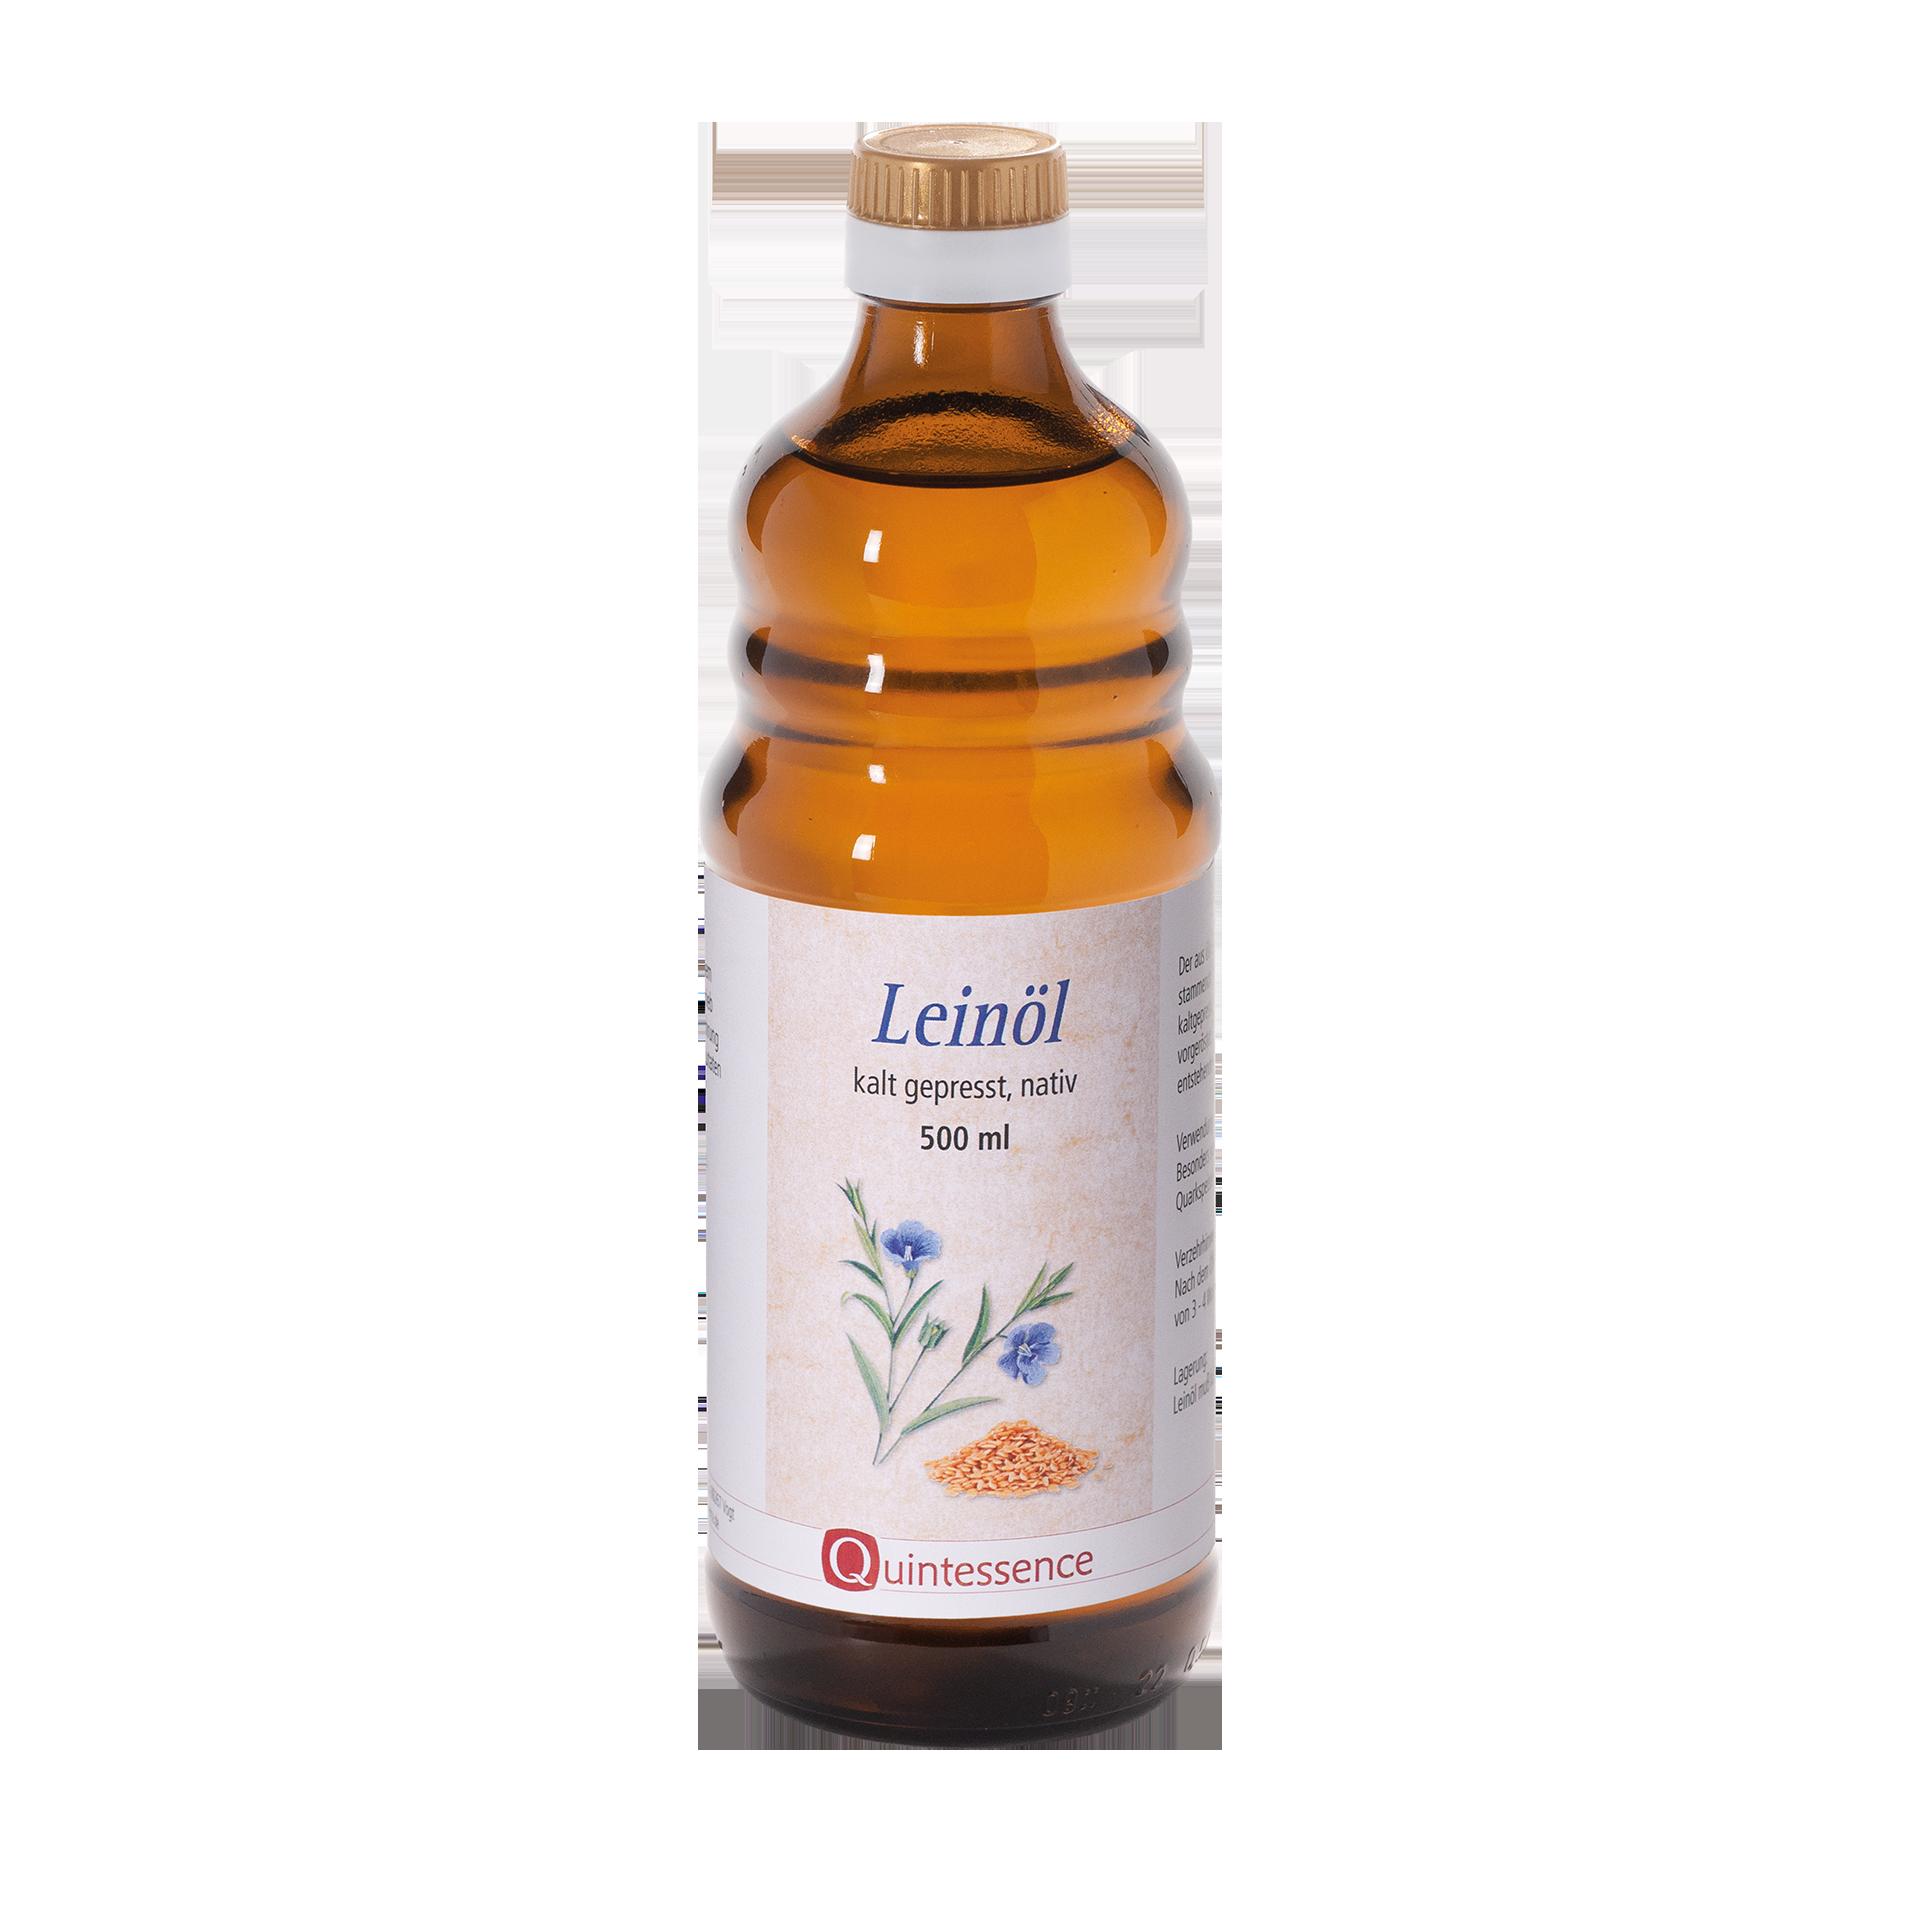 Leinöl, 500 ml